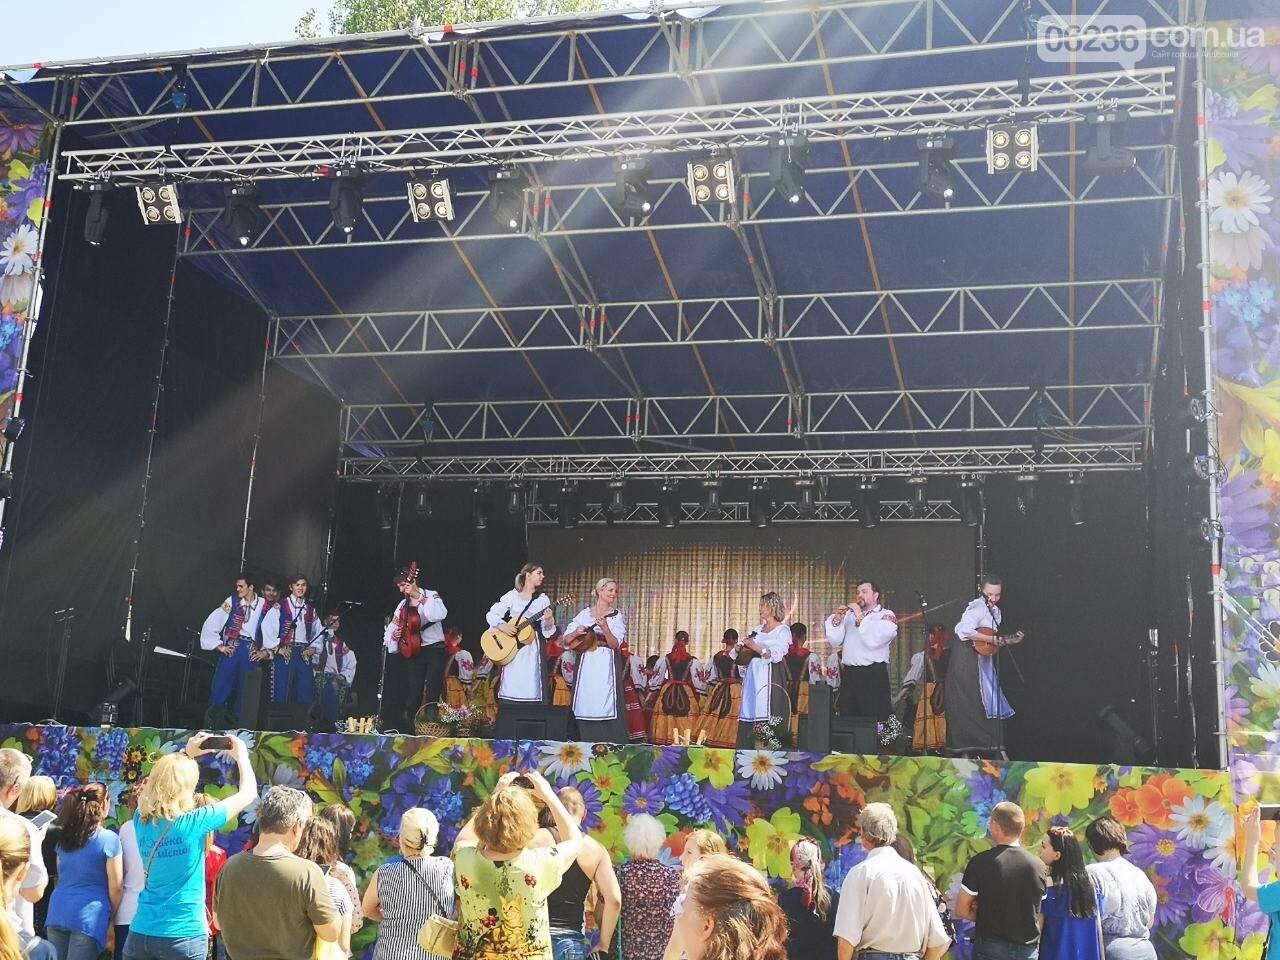 Авдеевка блистала на фестивале ко Дню Европы в Бахмуте (ФОТО/ВИДЕО)   , фото-1